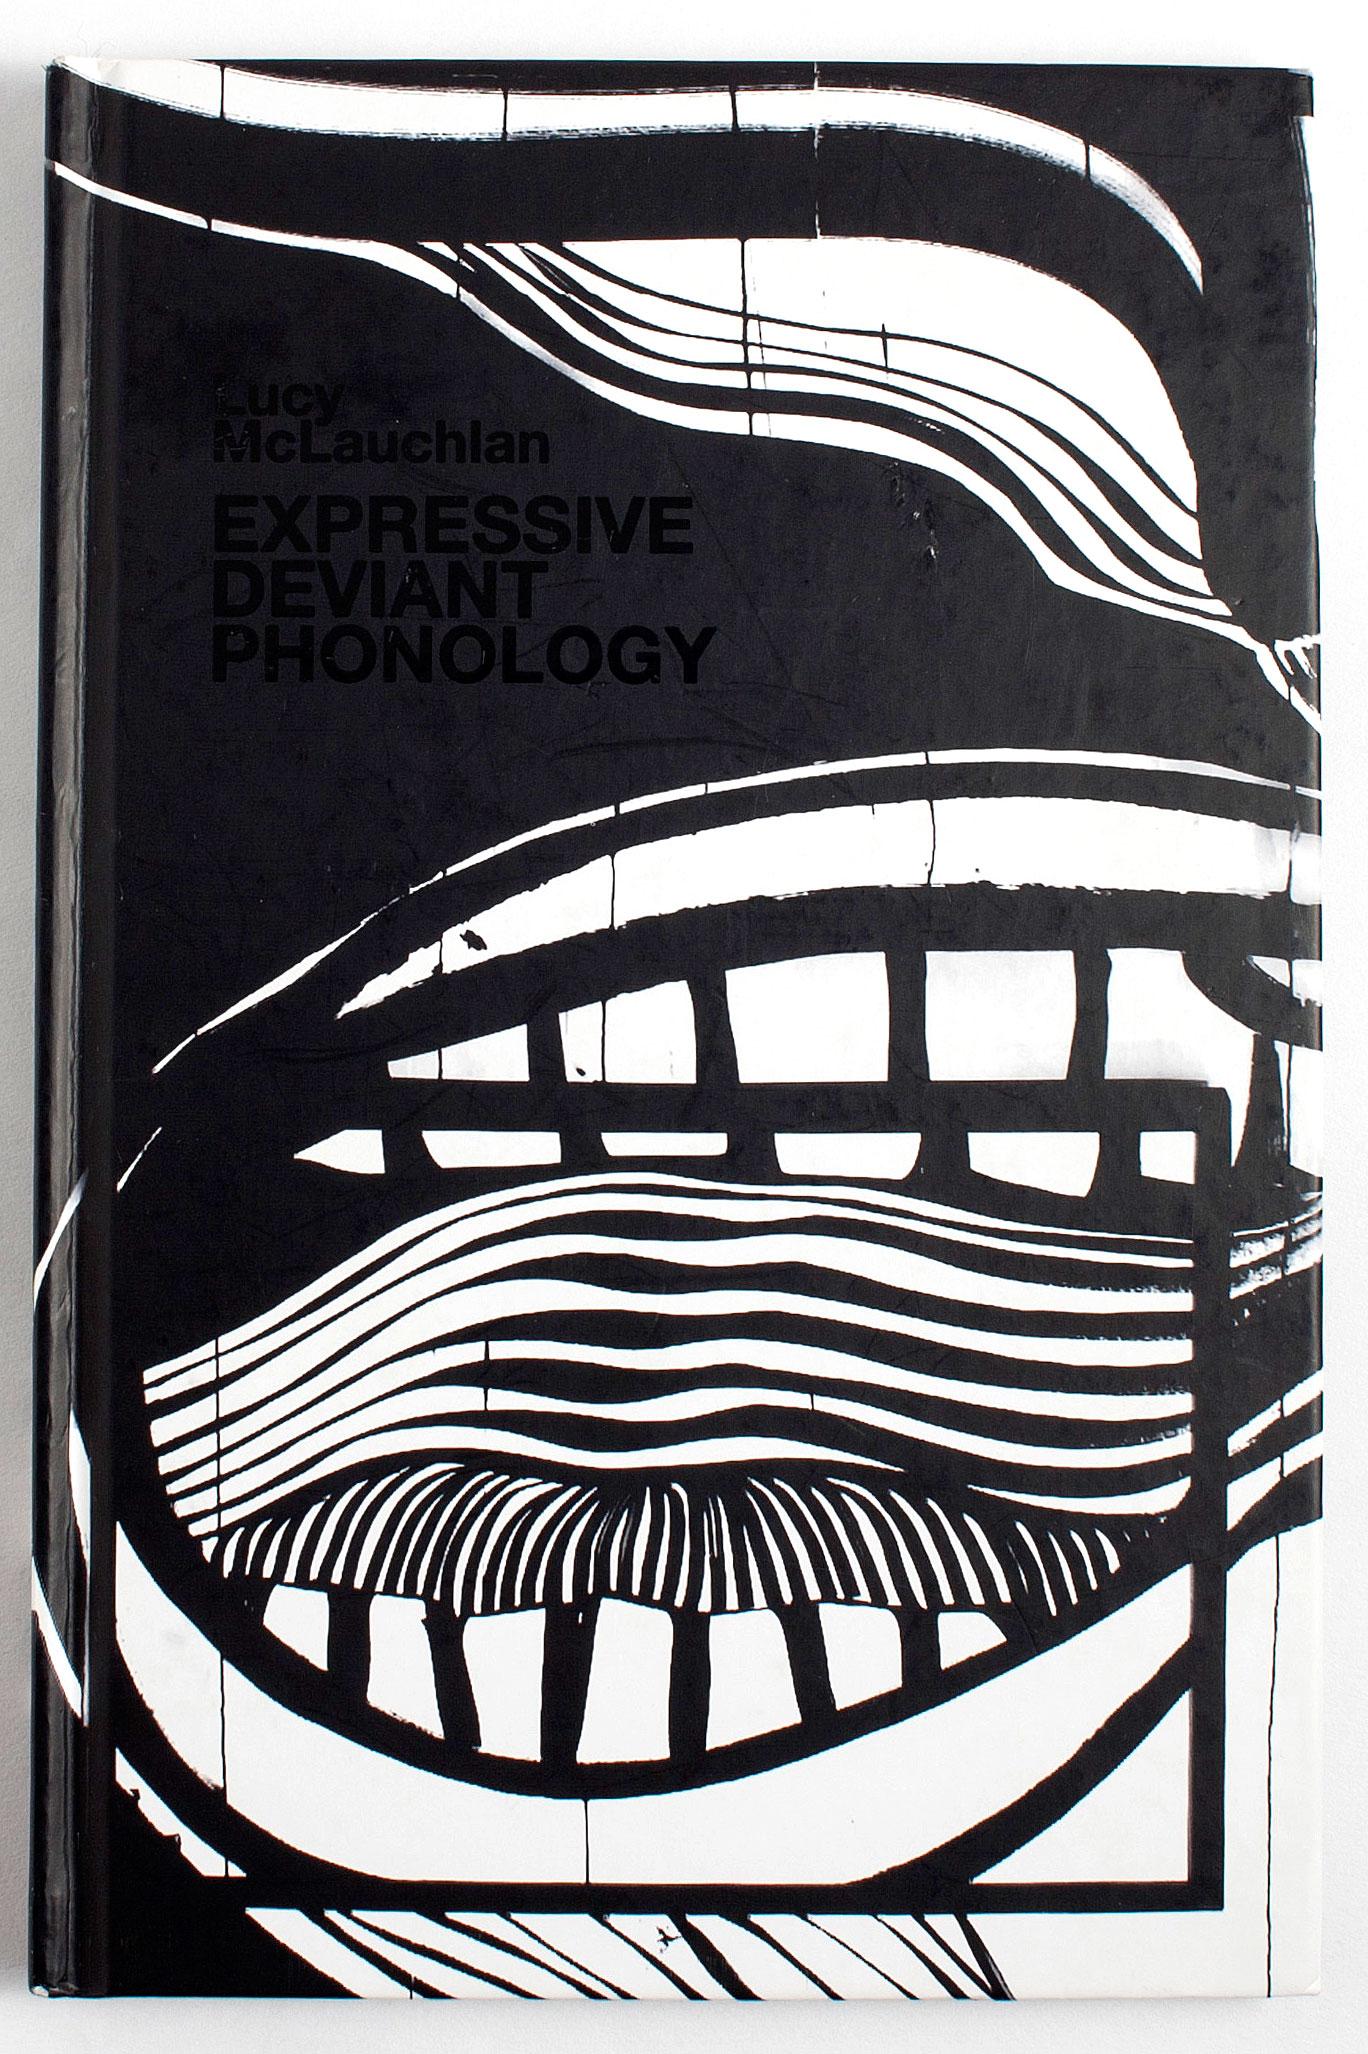 epm-print-management-bristol-art-books-2.jpg